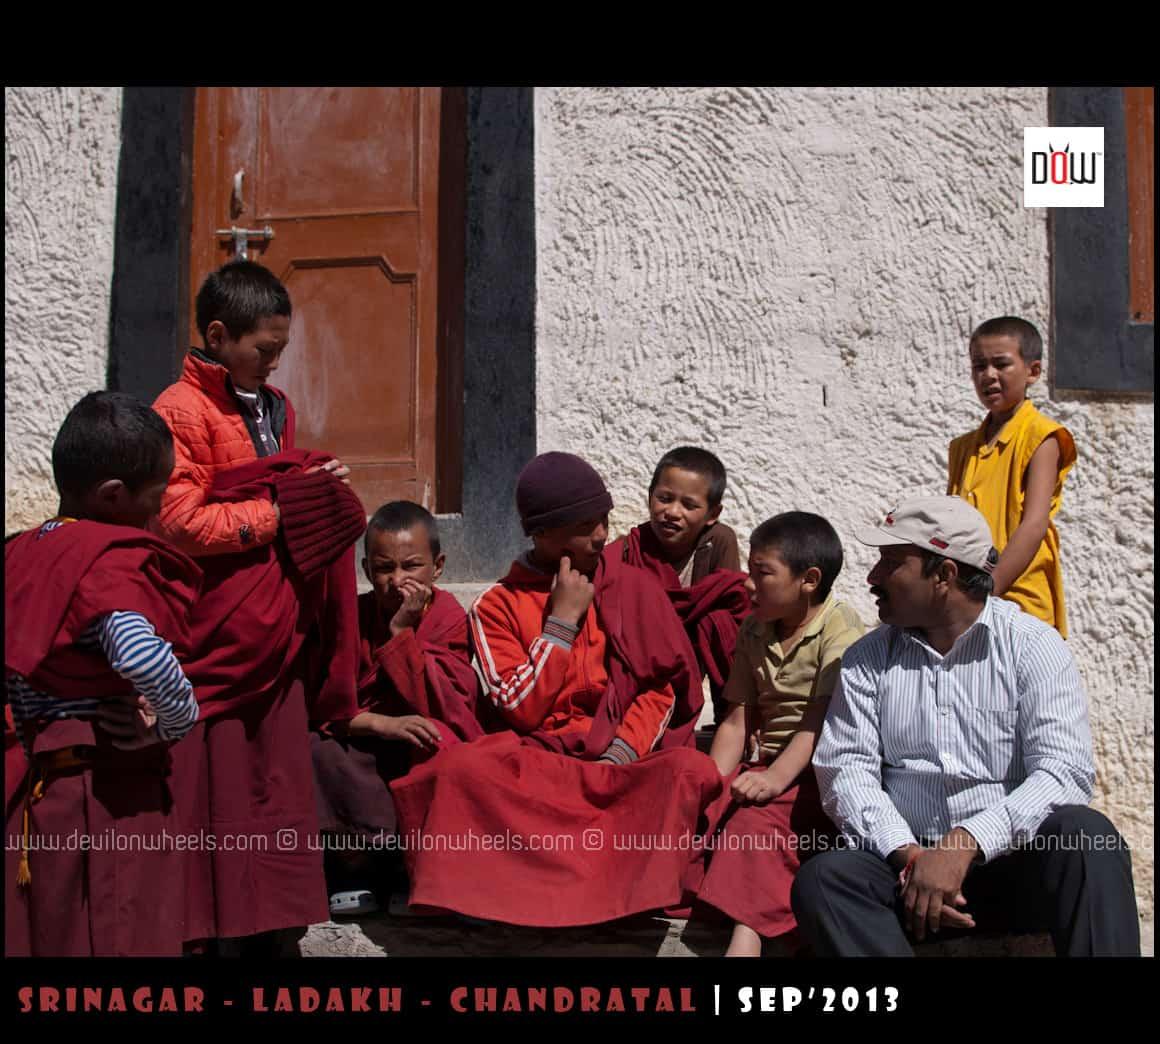 Jiwesh having candid time with Lama Kids at Lamayuru Monastery